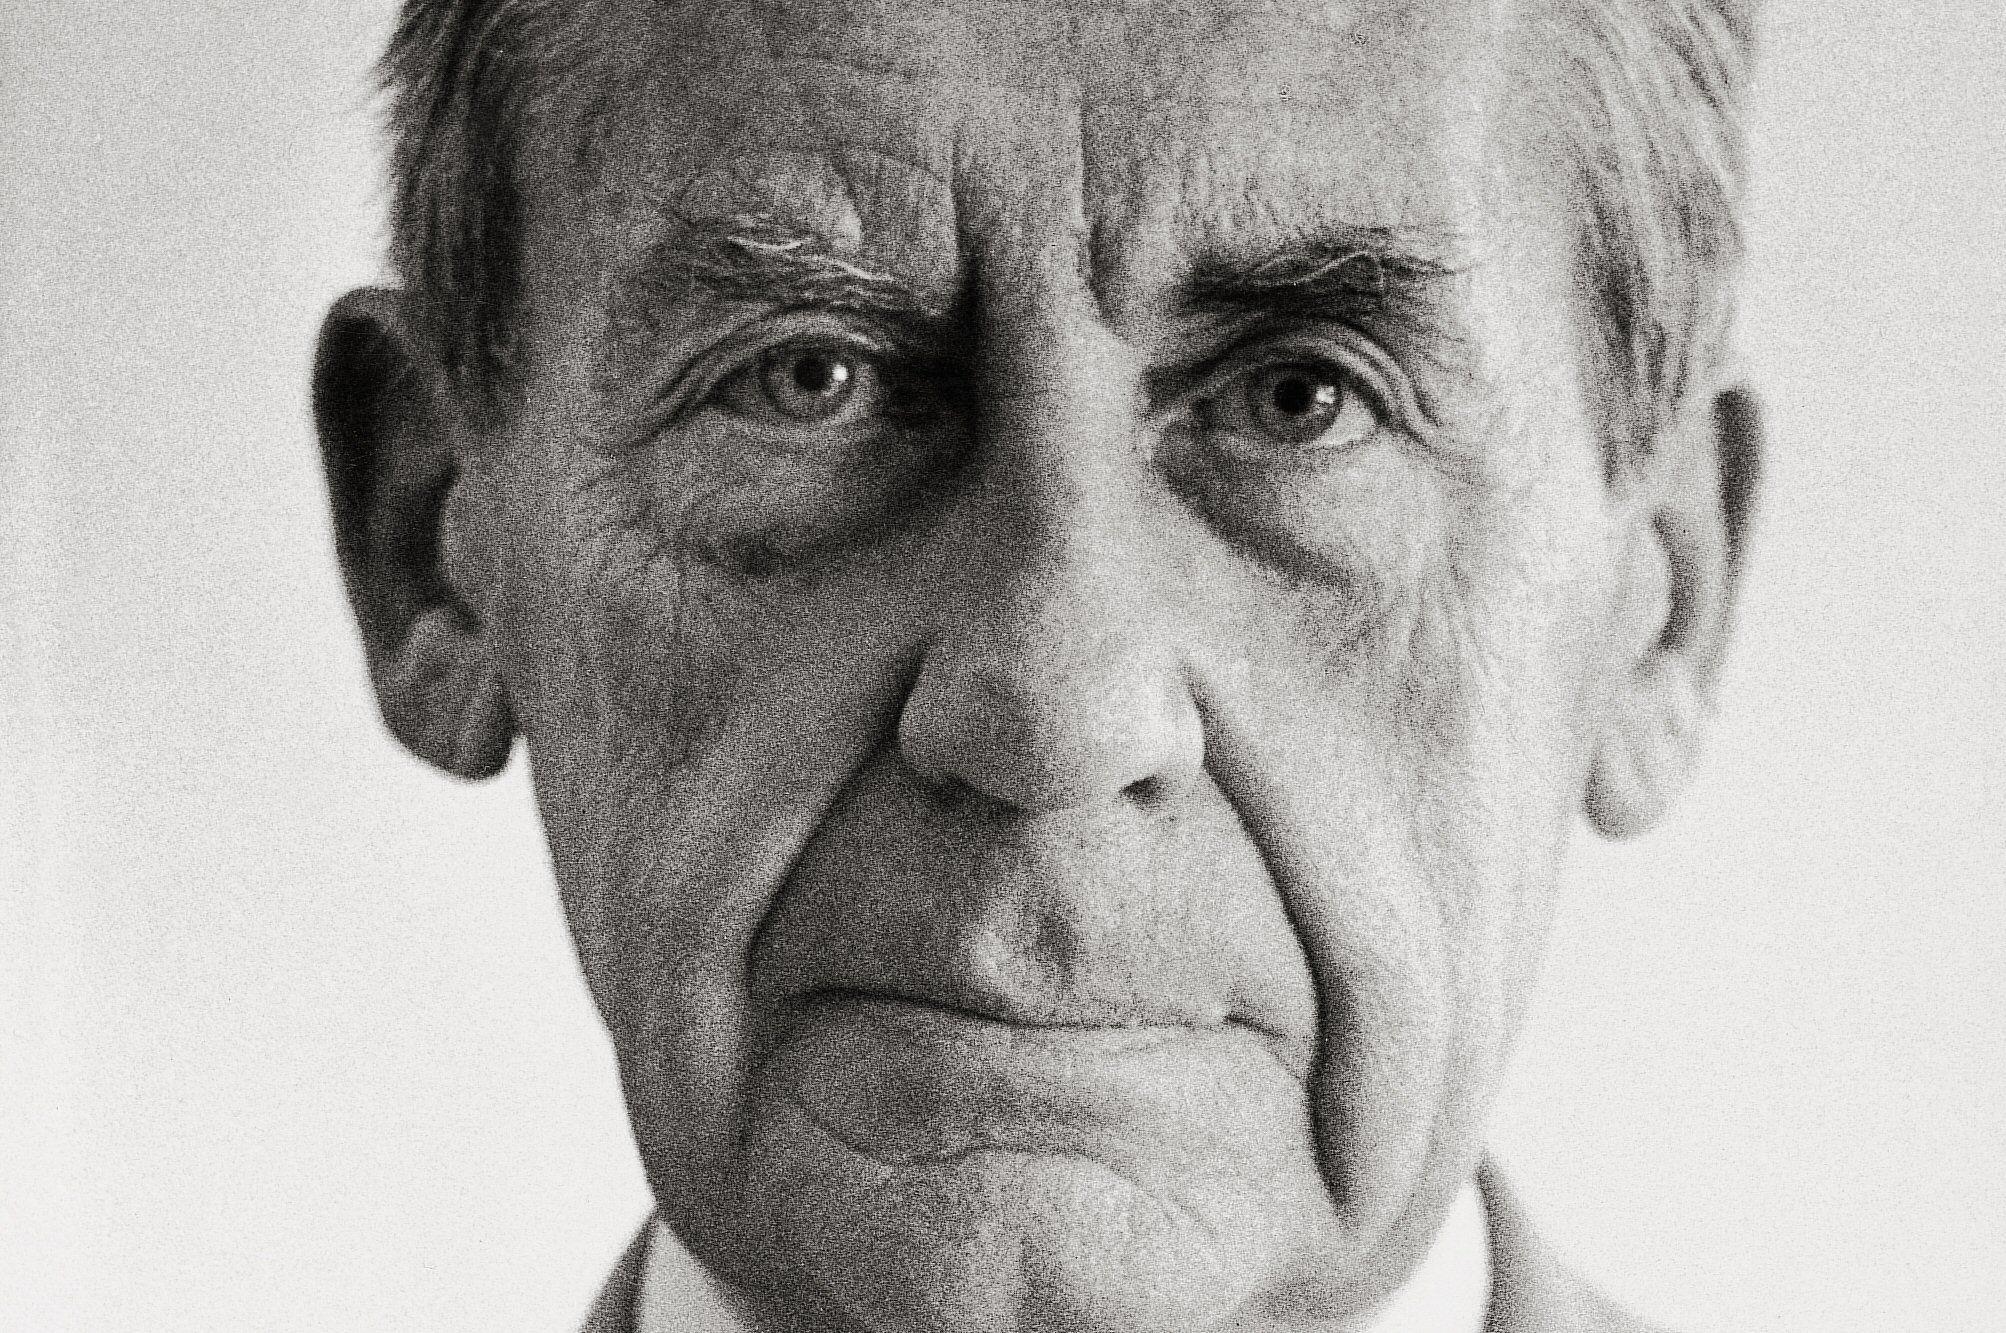 Walter Gropius Short Profile Of The Bauhaus Designer